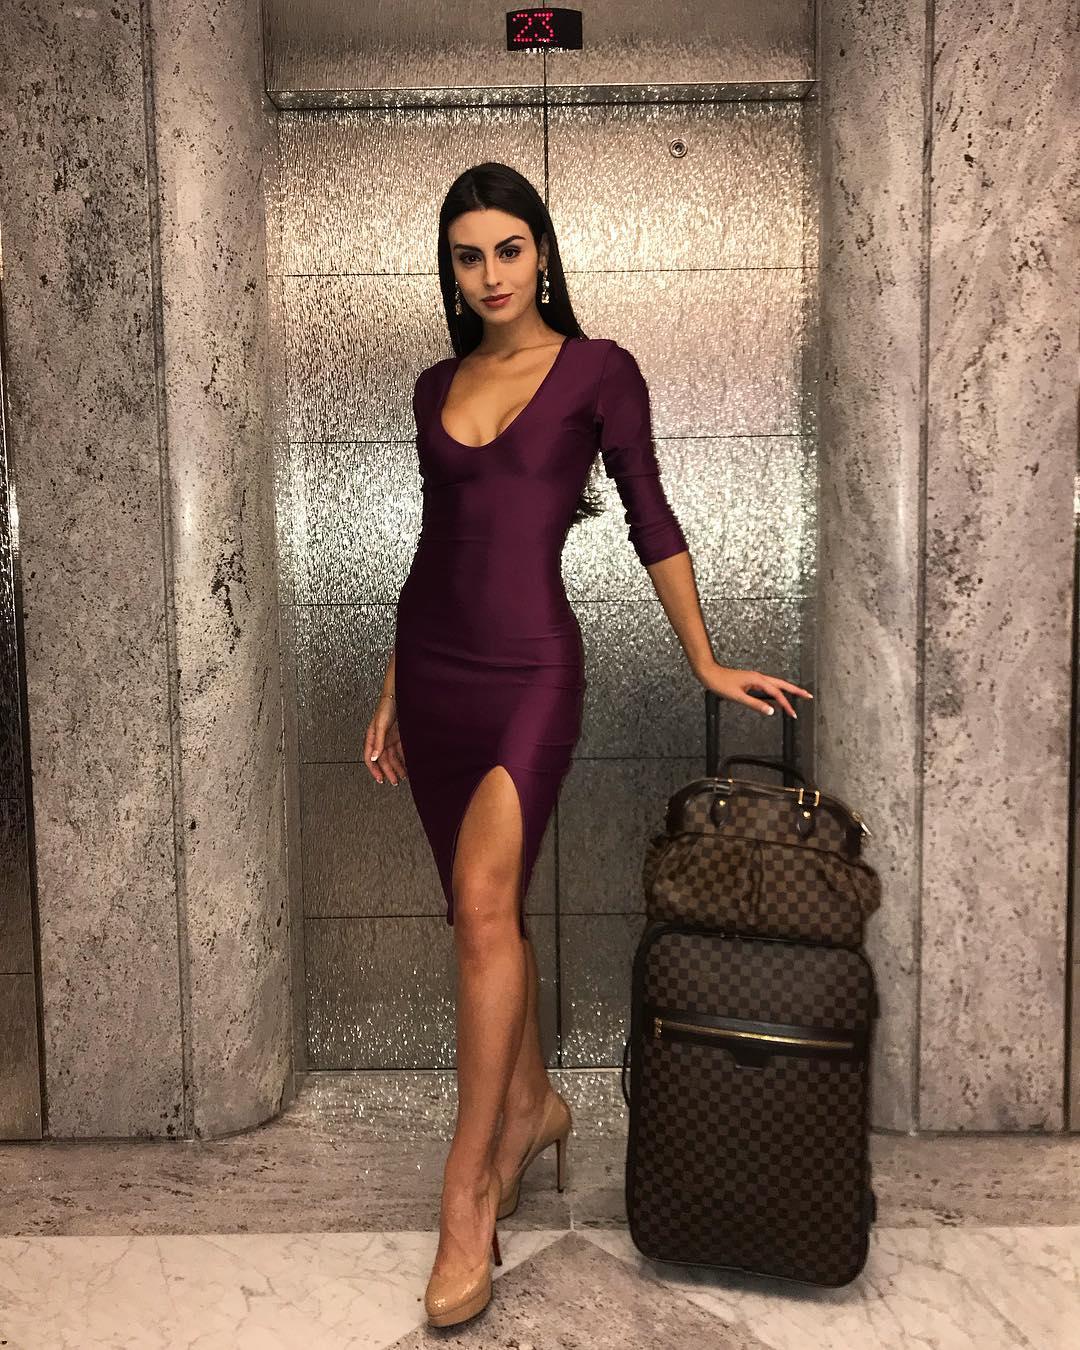 marjorie marcelle, top 5 de miss grand international 2019. - Página 2 43817410